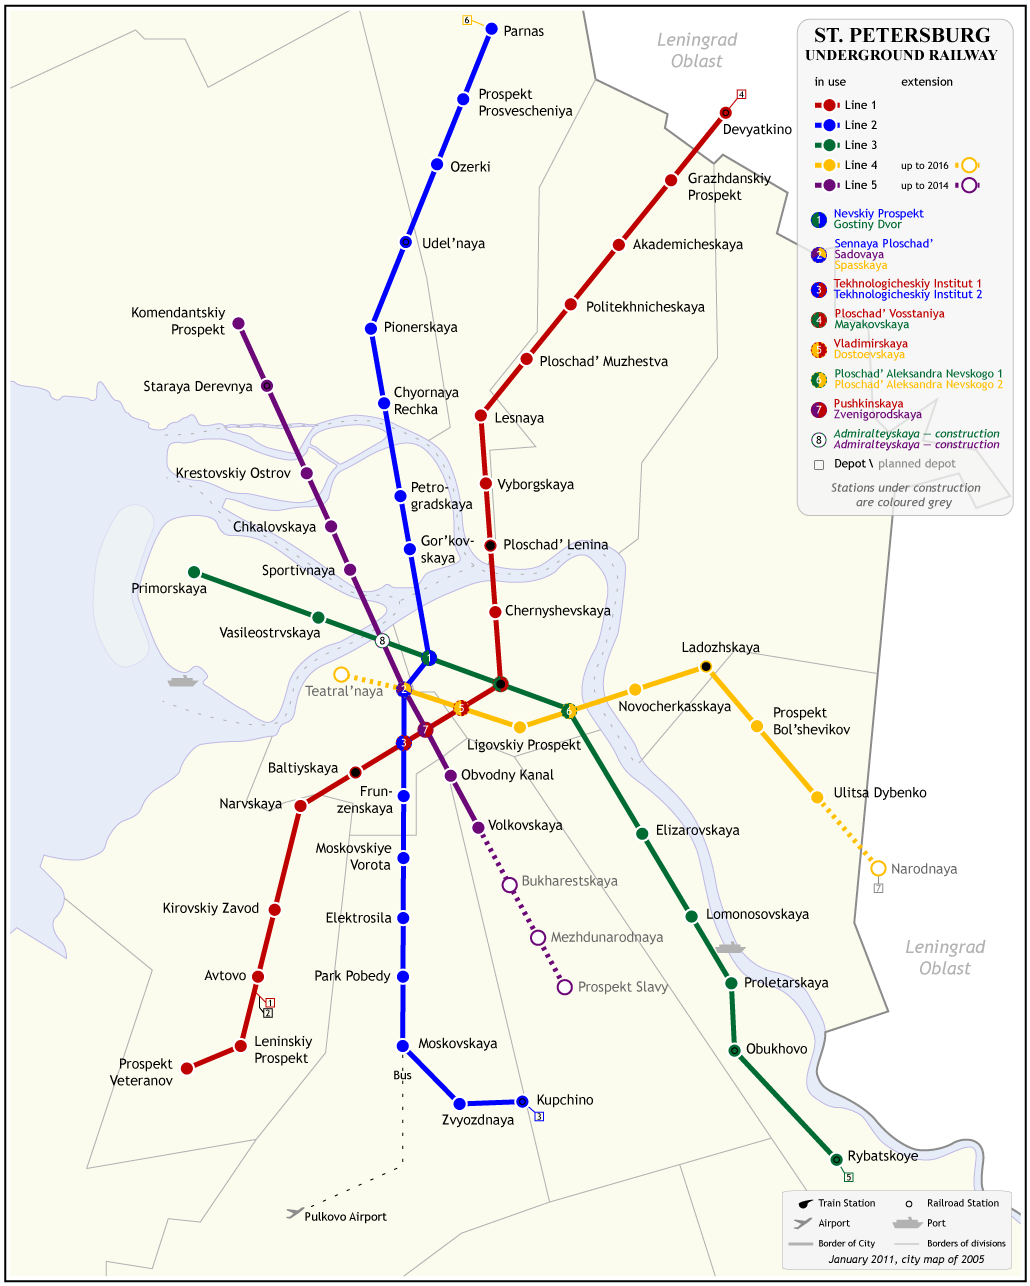 File:Saint Petersburg Underground Railway Map.png - Wikimedia Commons